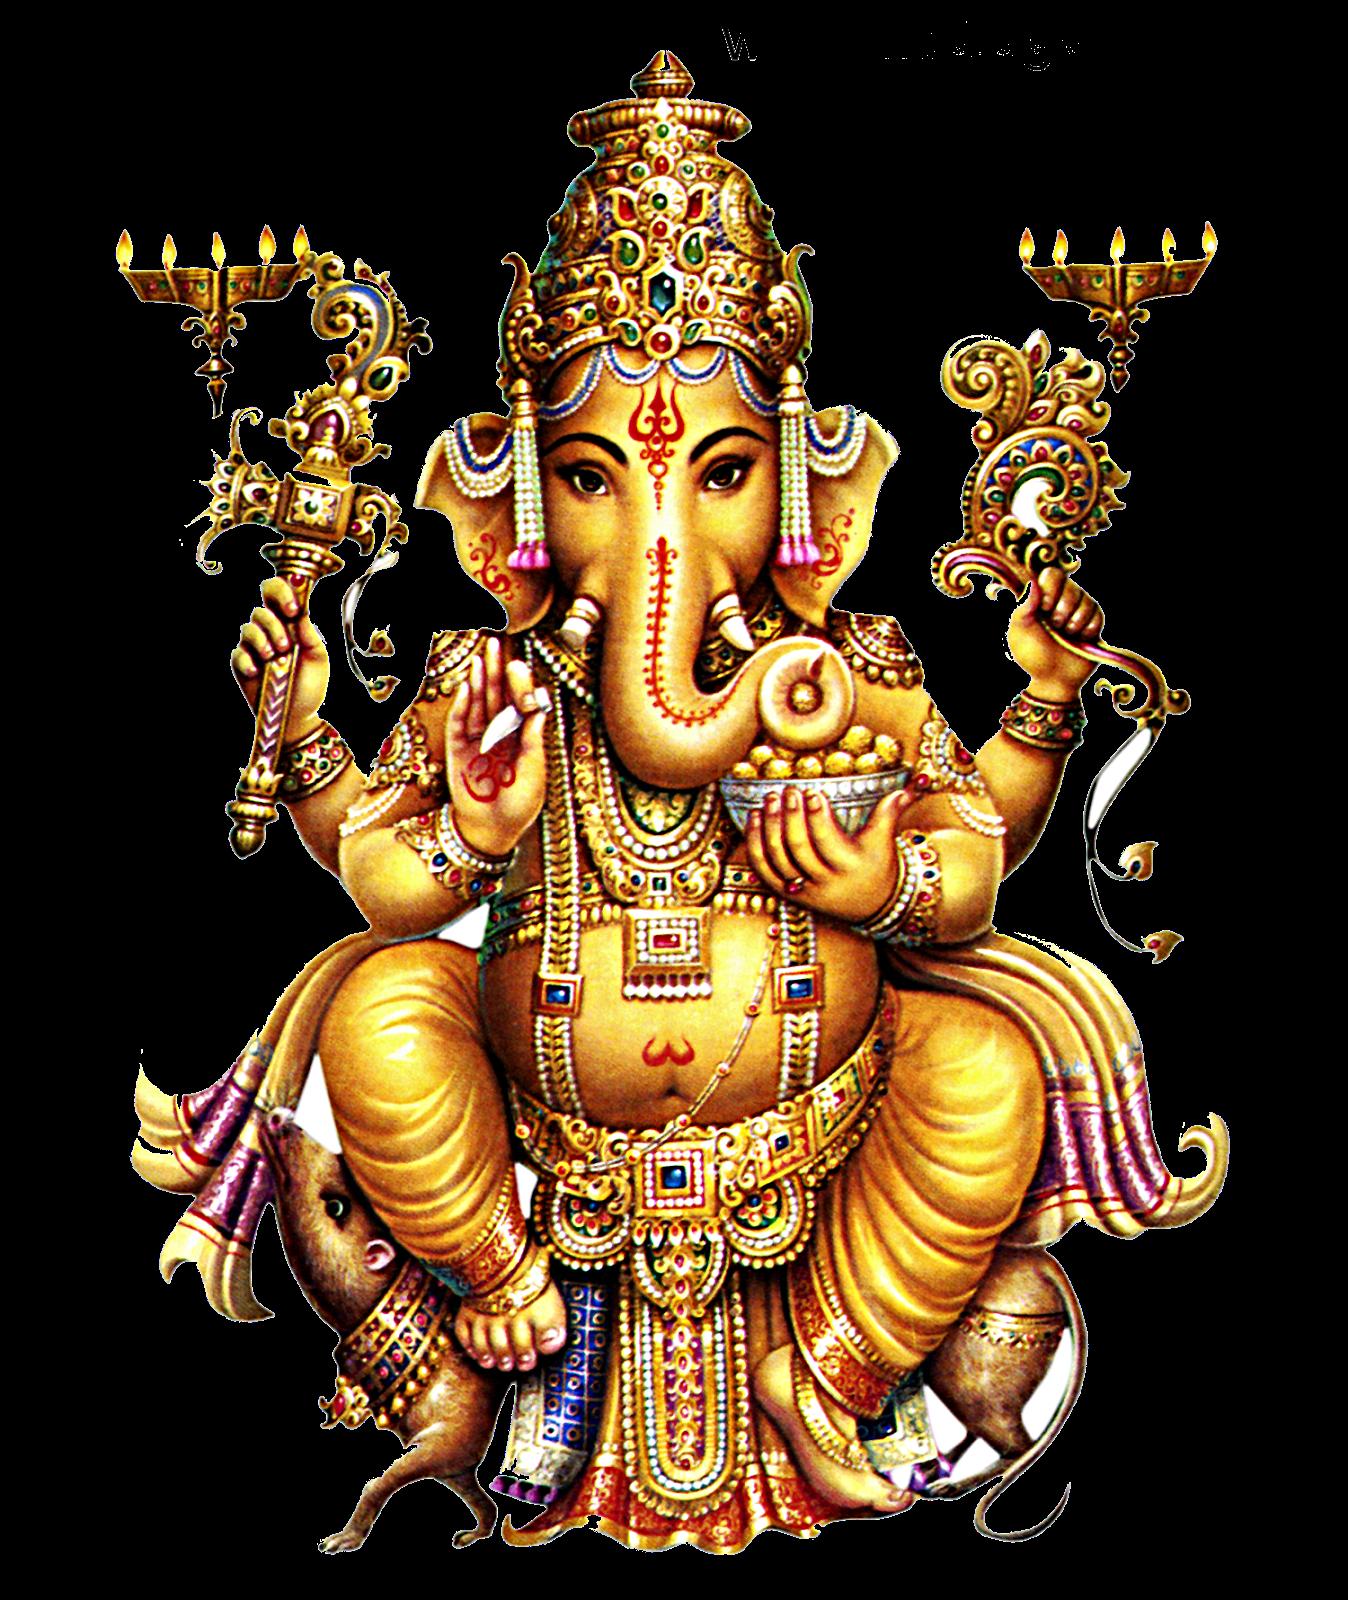 Nanidesigining Png Ganesh Ganesha Ganesh Lord Ganesha